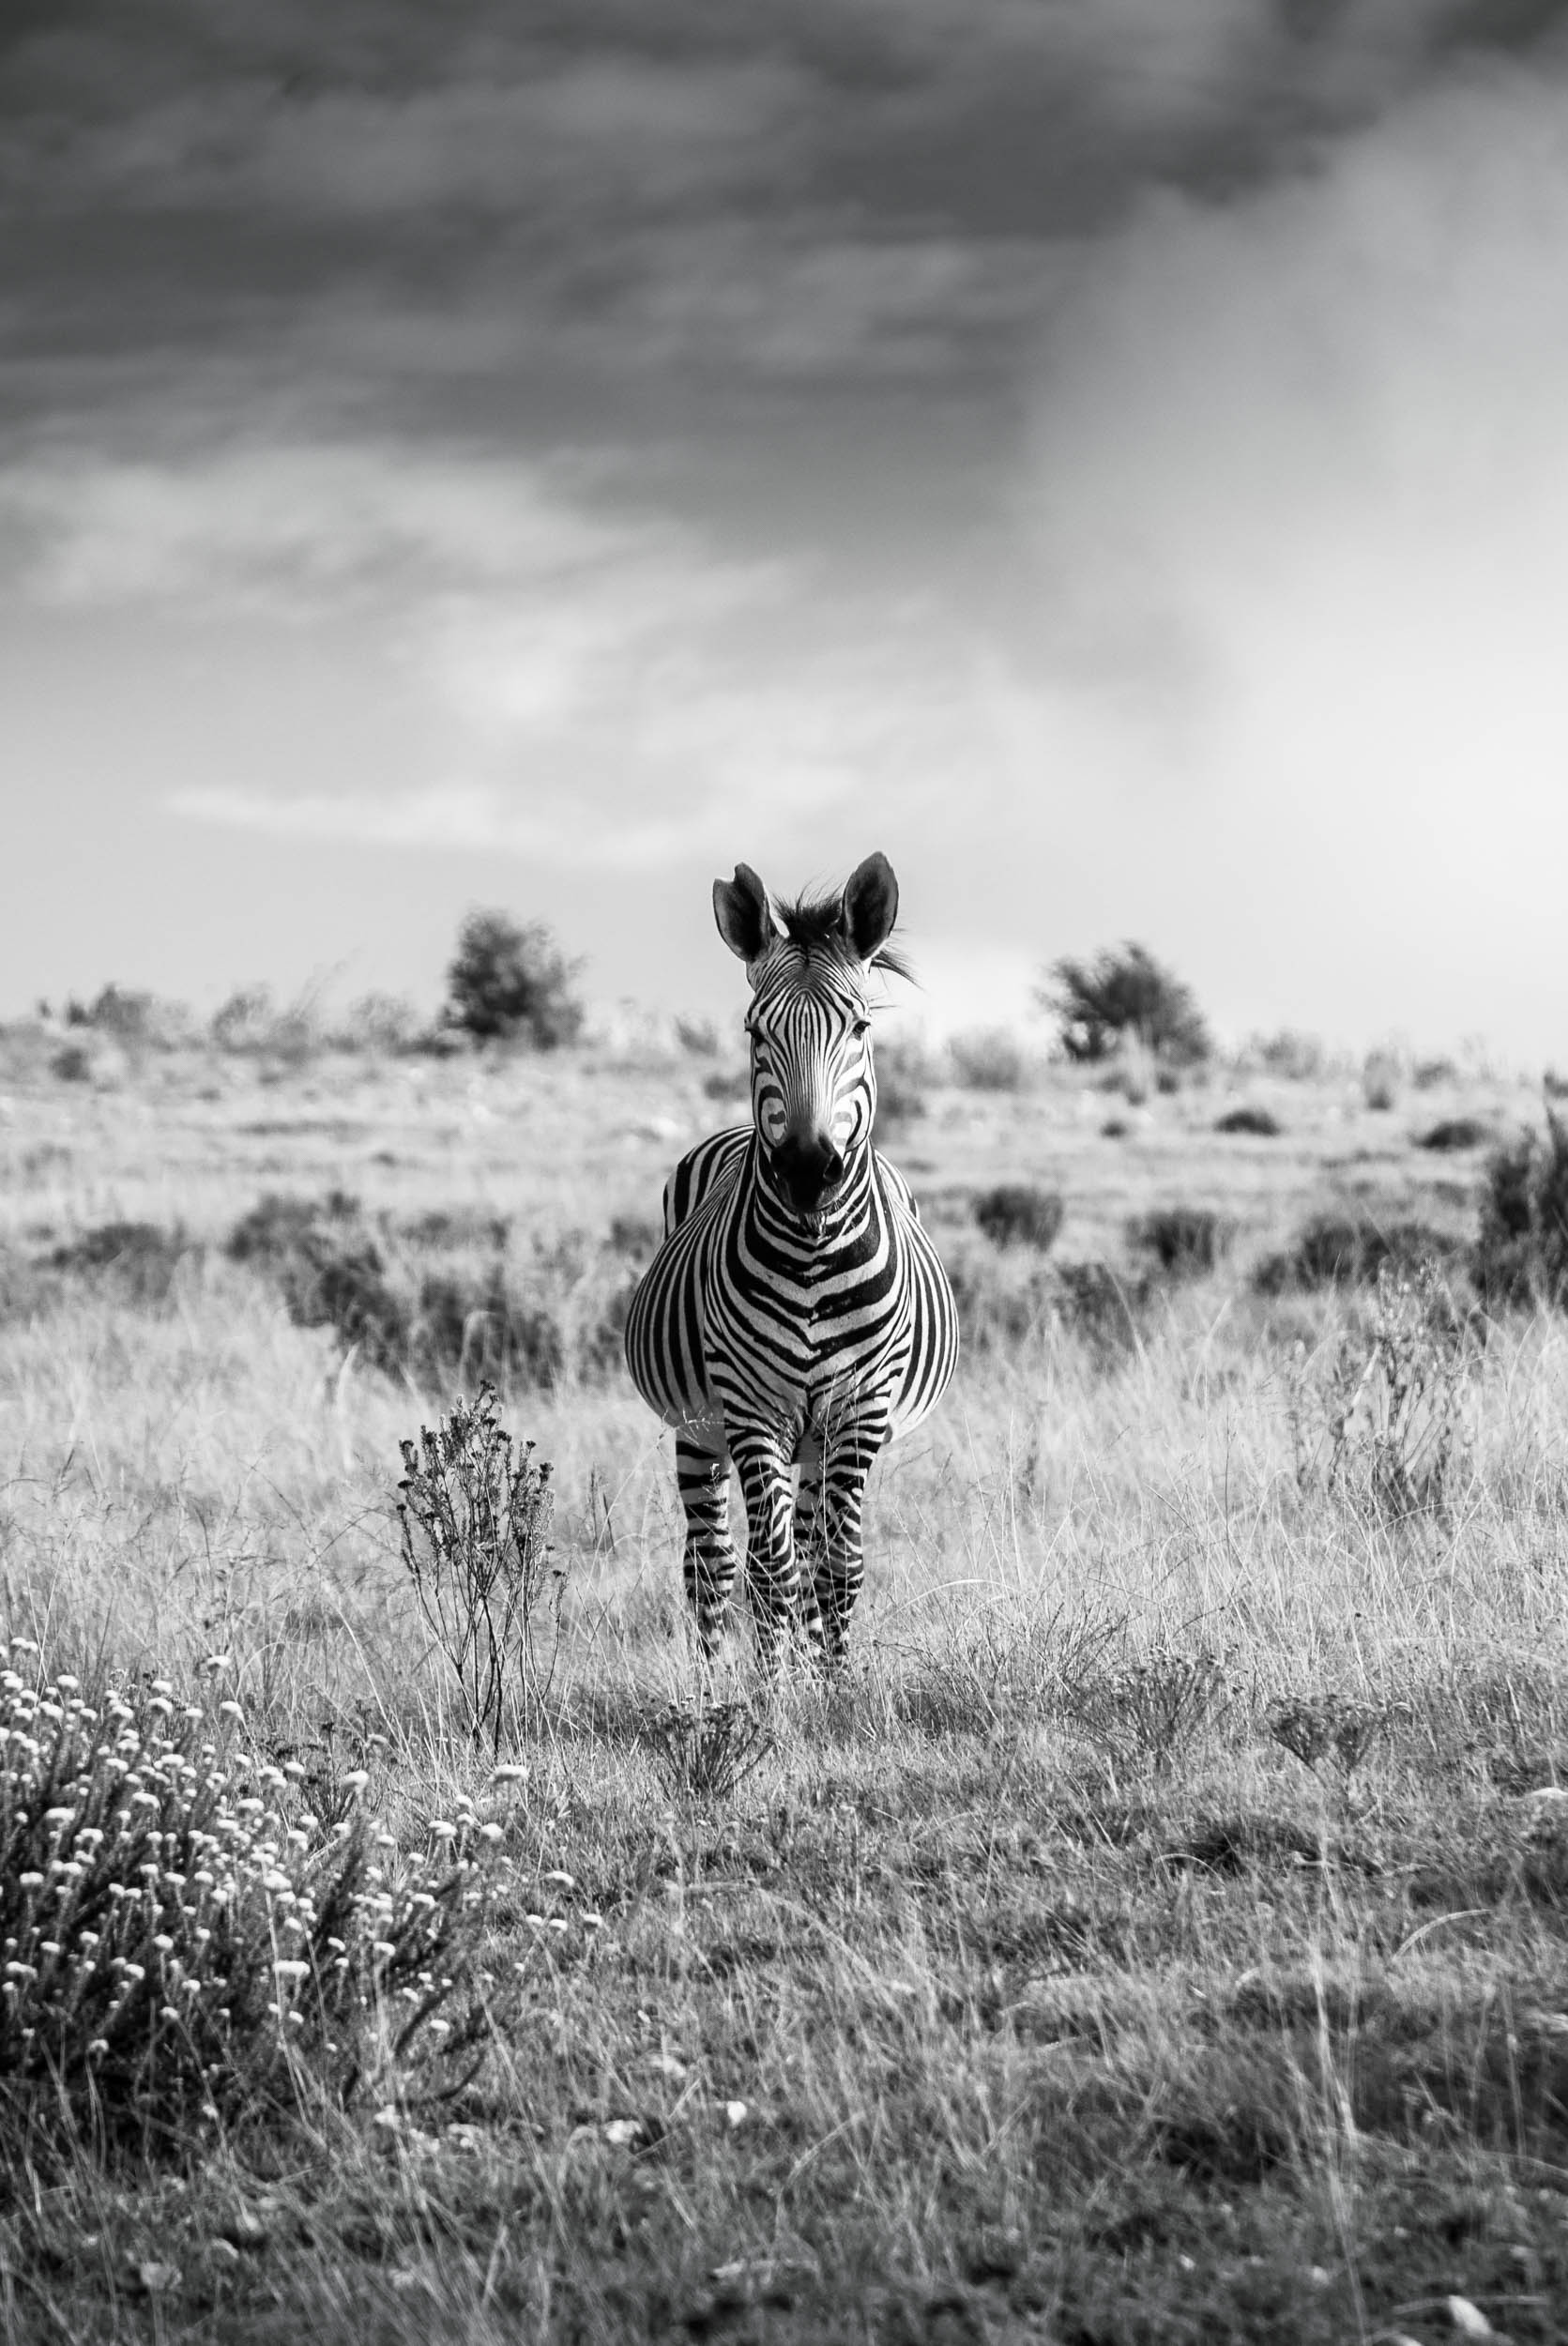 South-Africa-2013-21.jpg